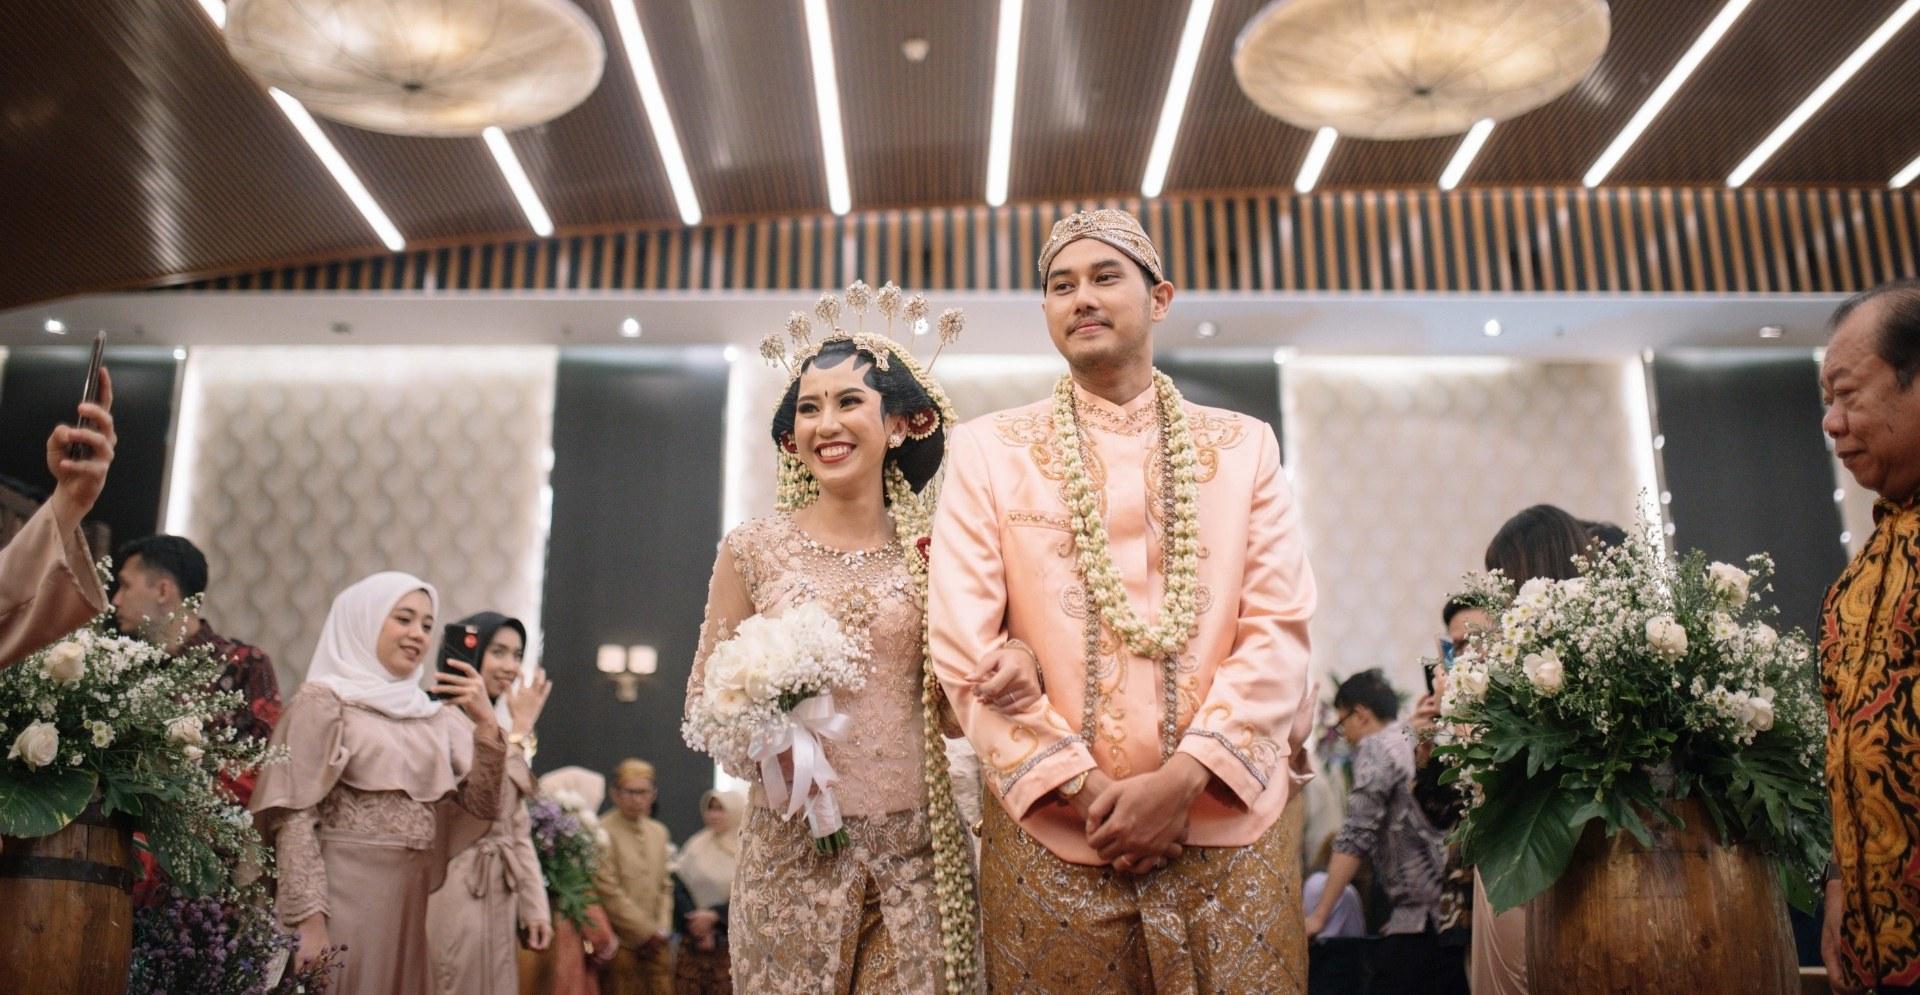 Bentuk Gaun Pengantin Muslim Gold Wddj Ikk Indonesia